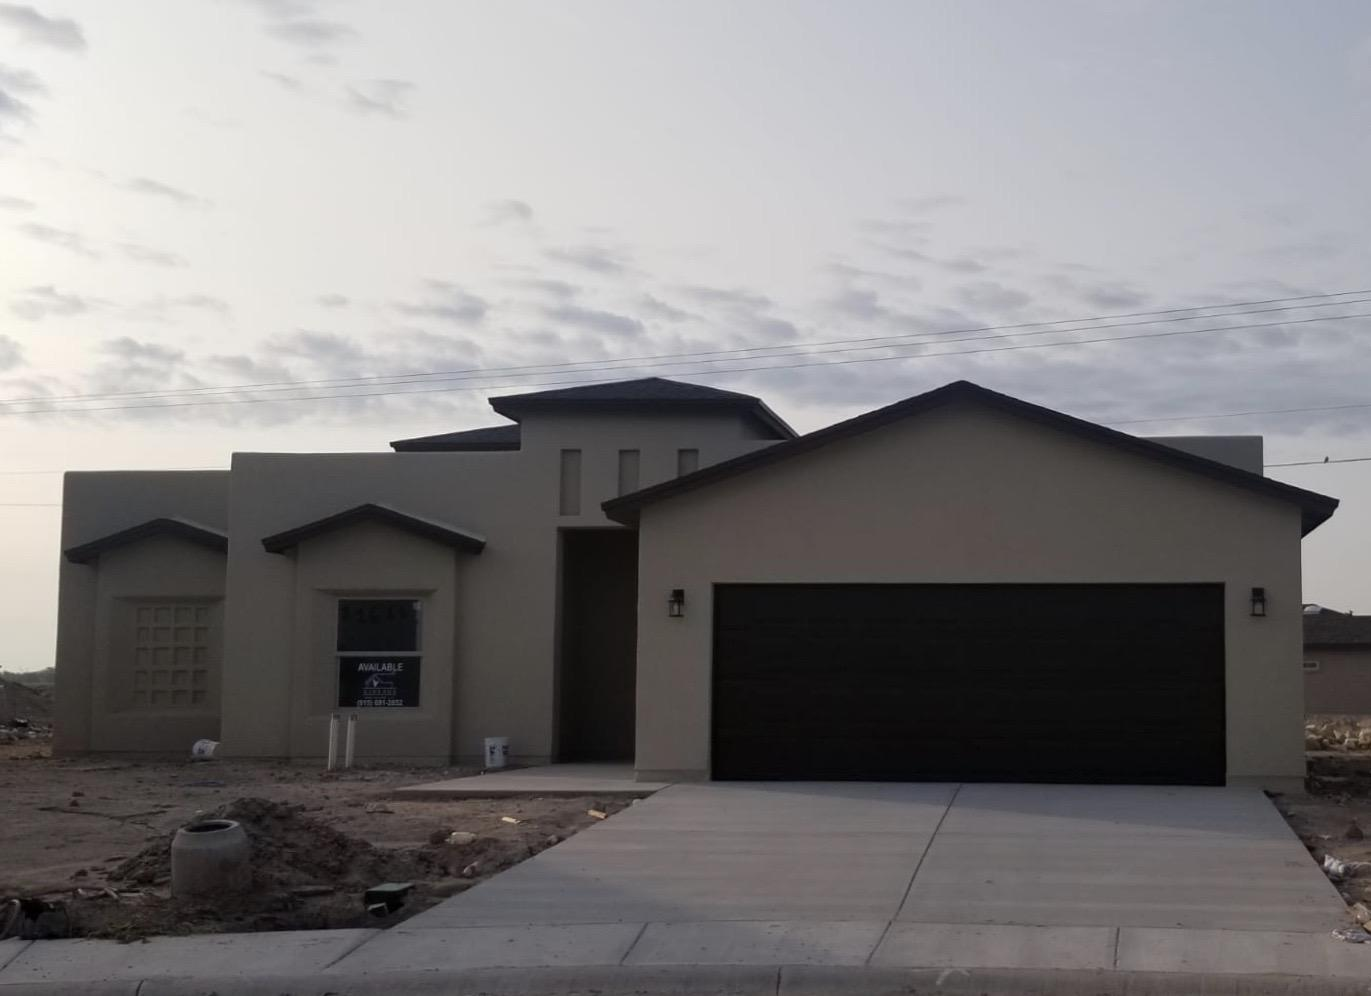 11681 Flor Freesia, Socorro, Texas 79927, 4 Bedrooms Bedrooms, ,3 BathroomsBathrooms,Residential,For sale,Flor Freesia,834252